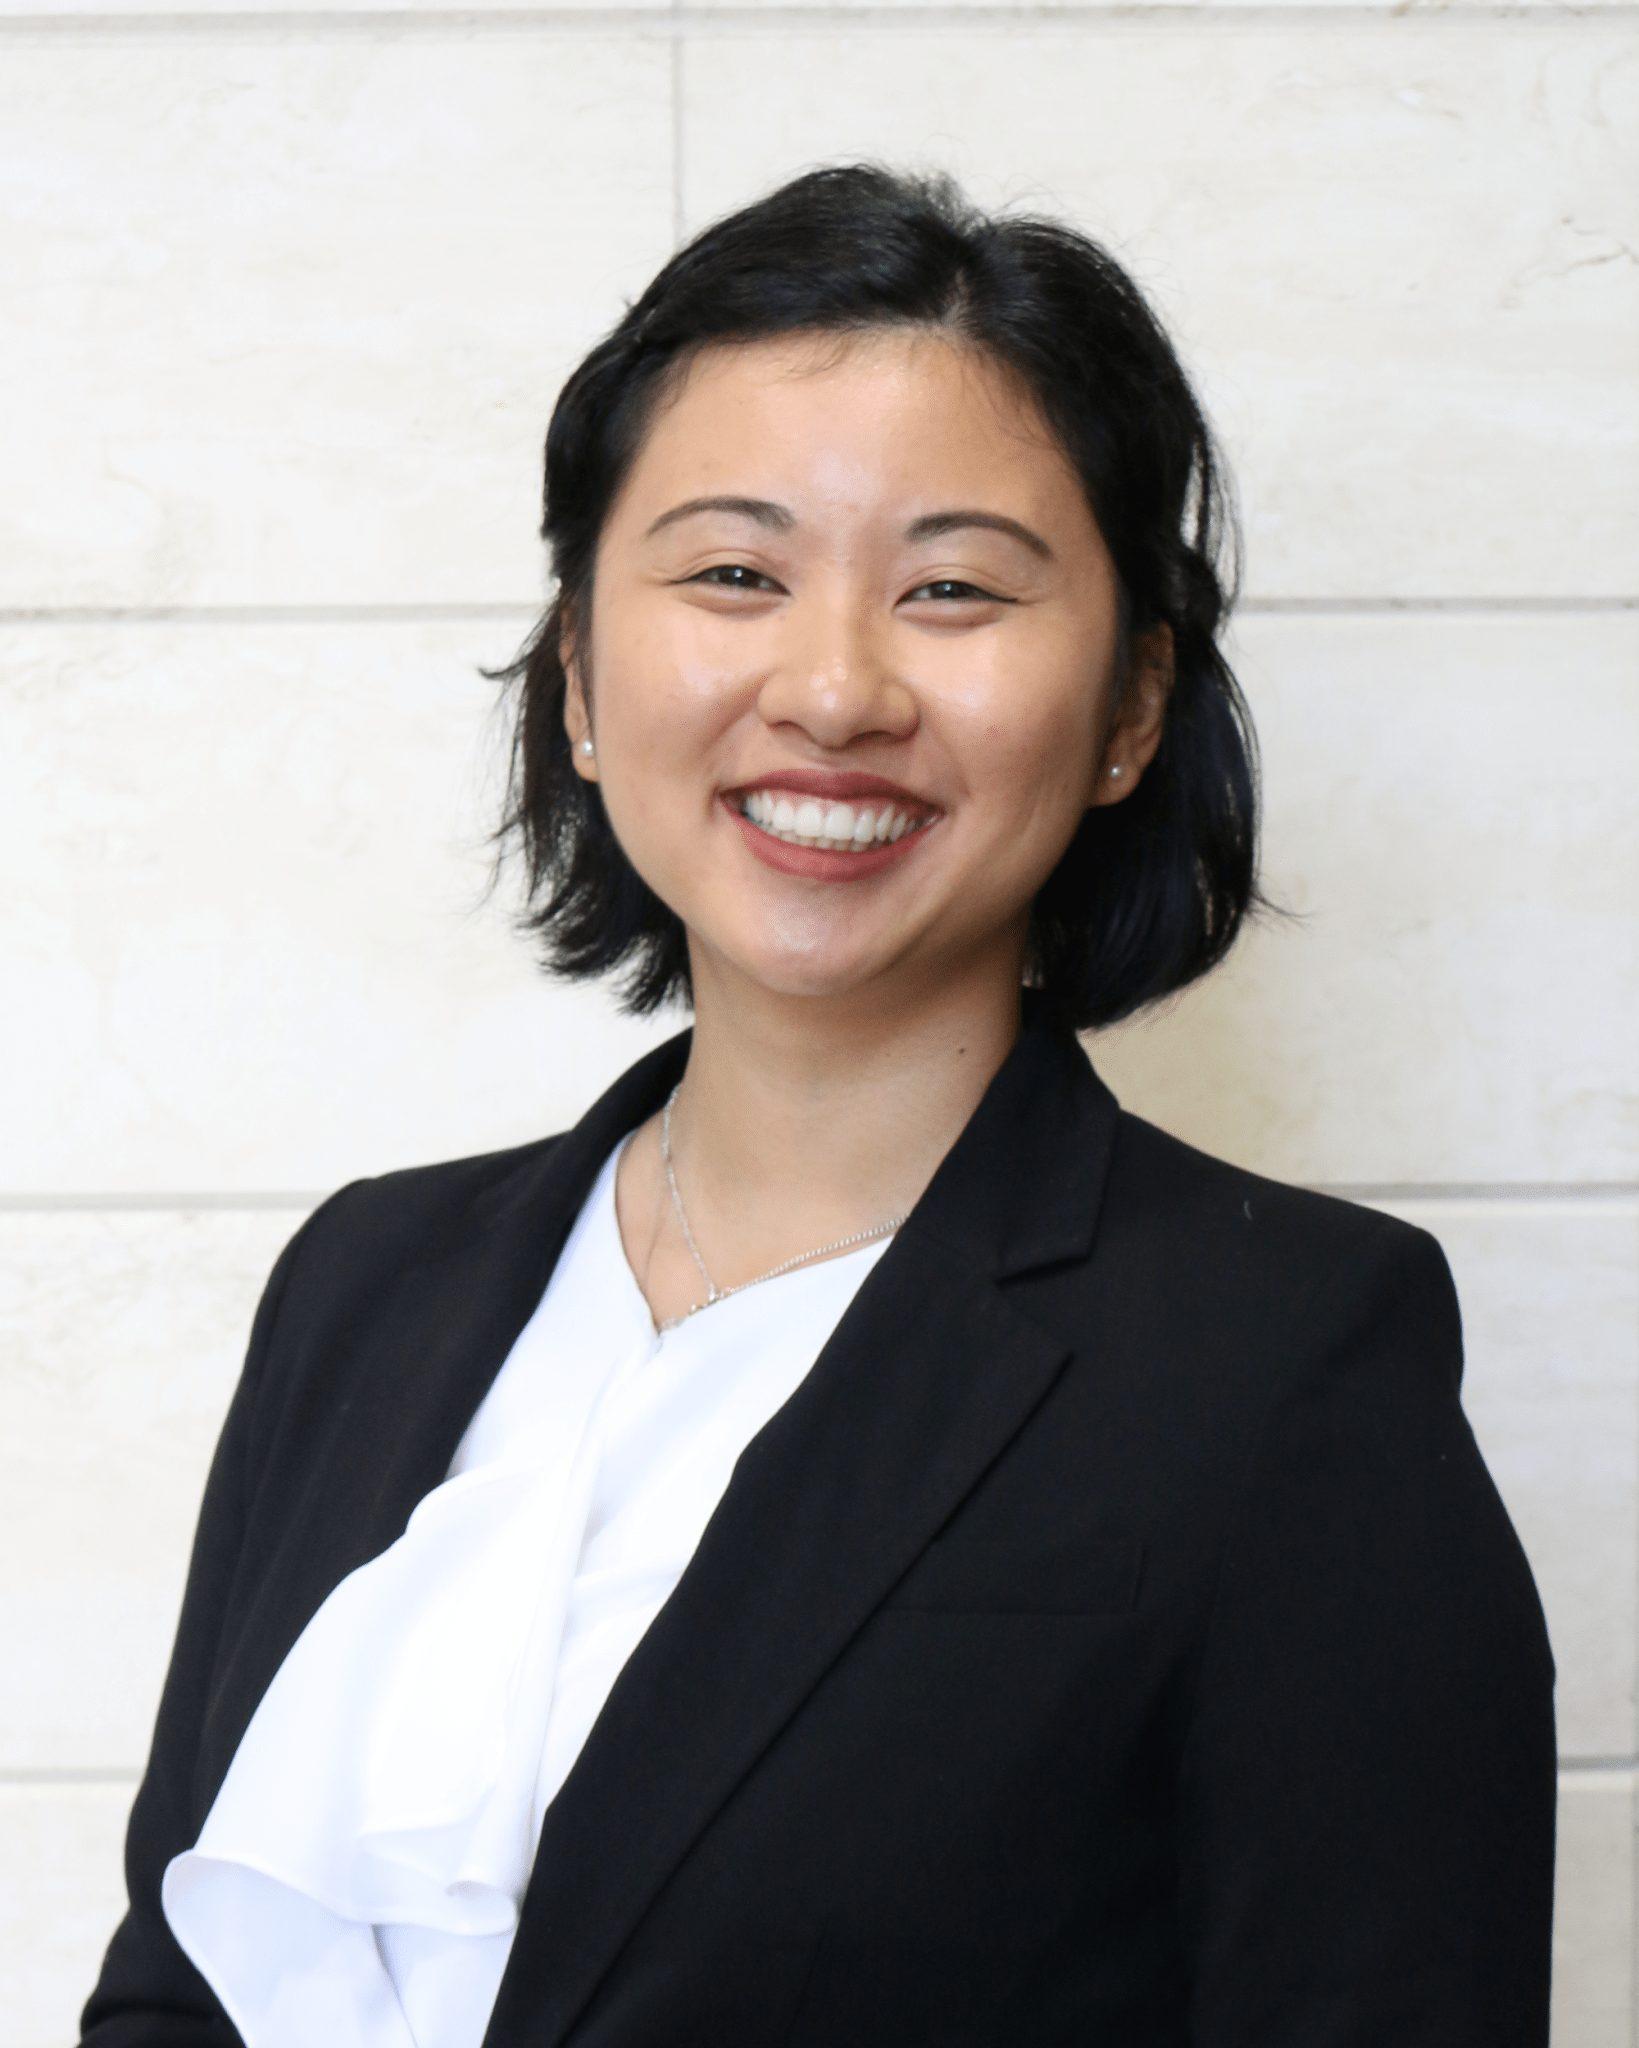 Sylvia Guan